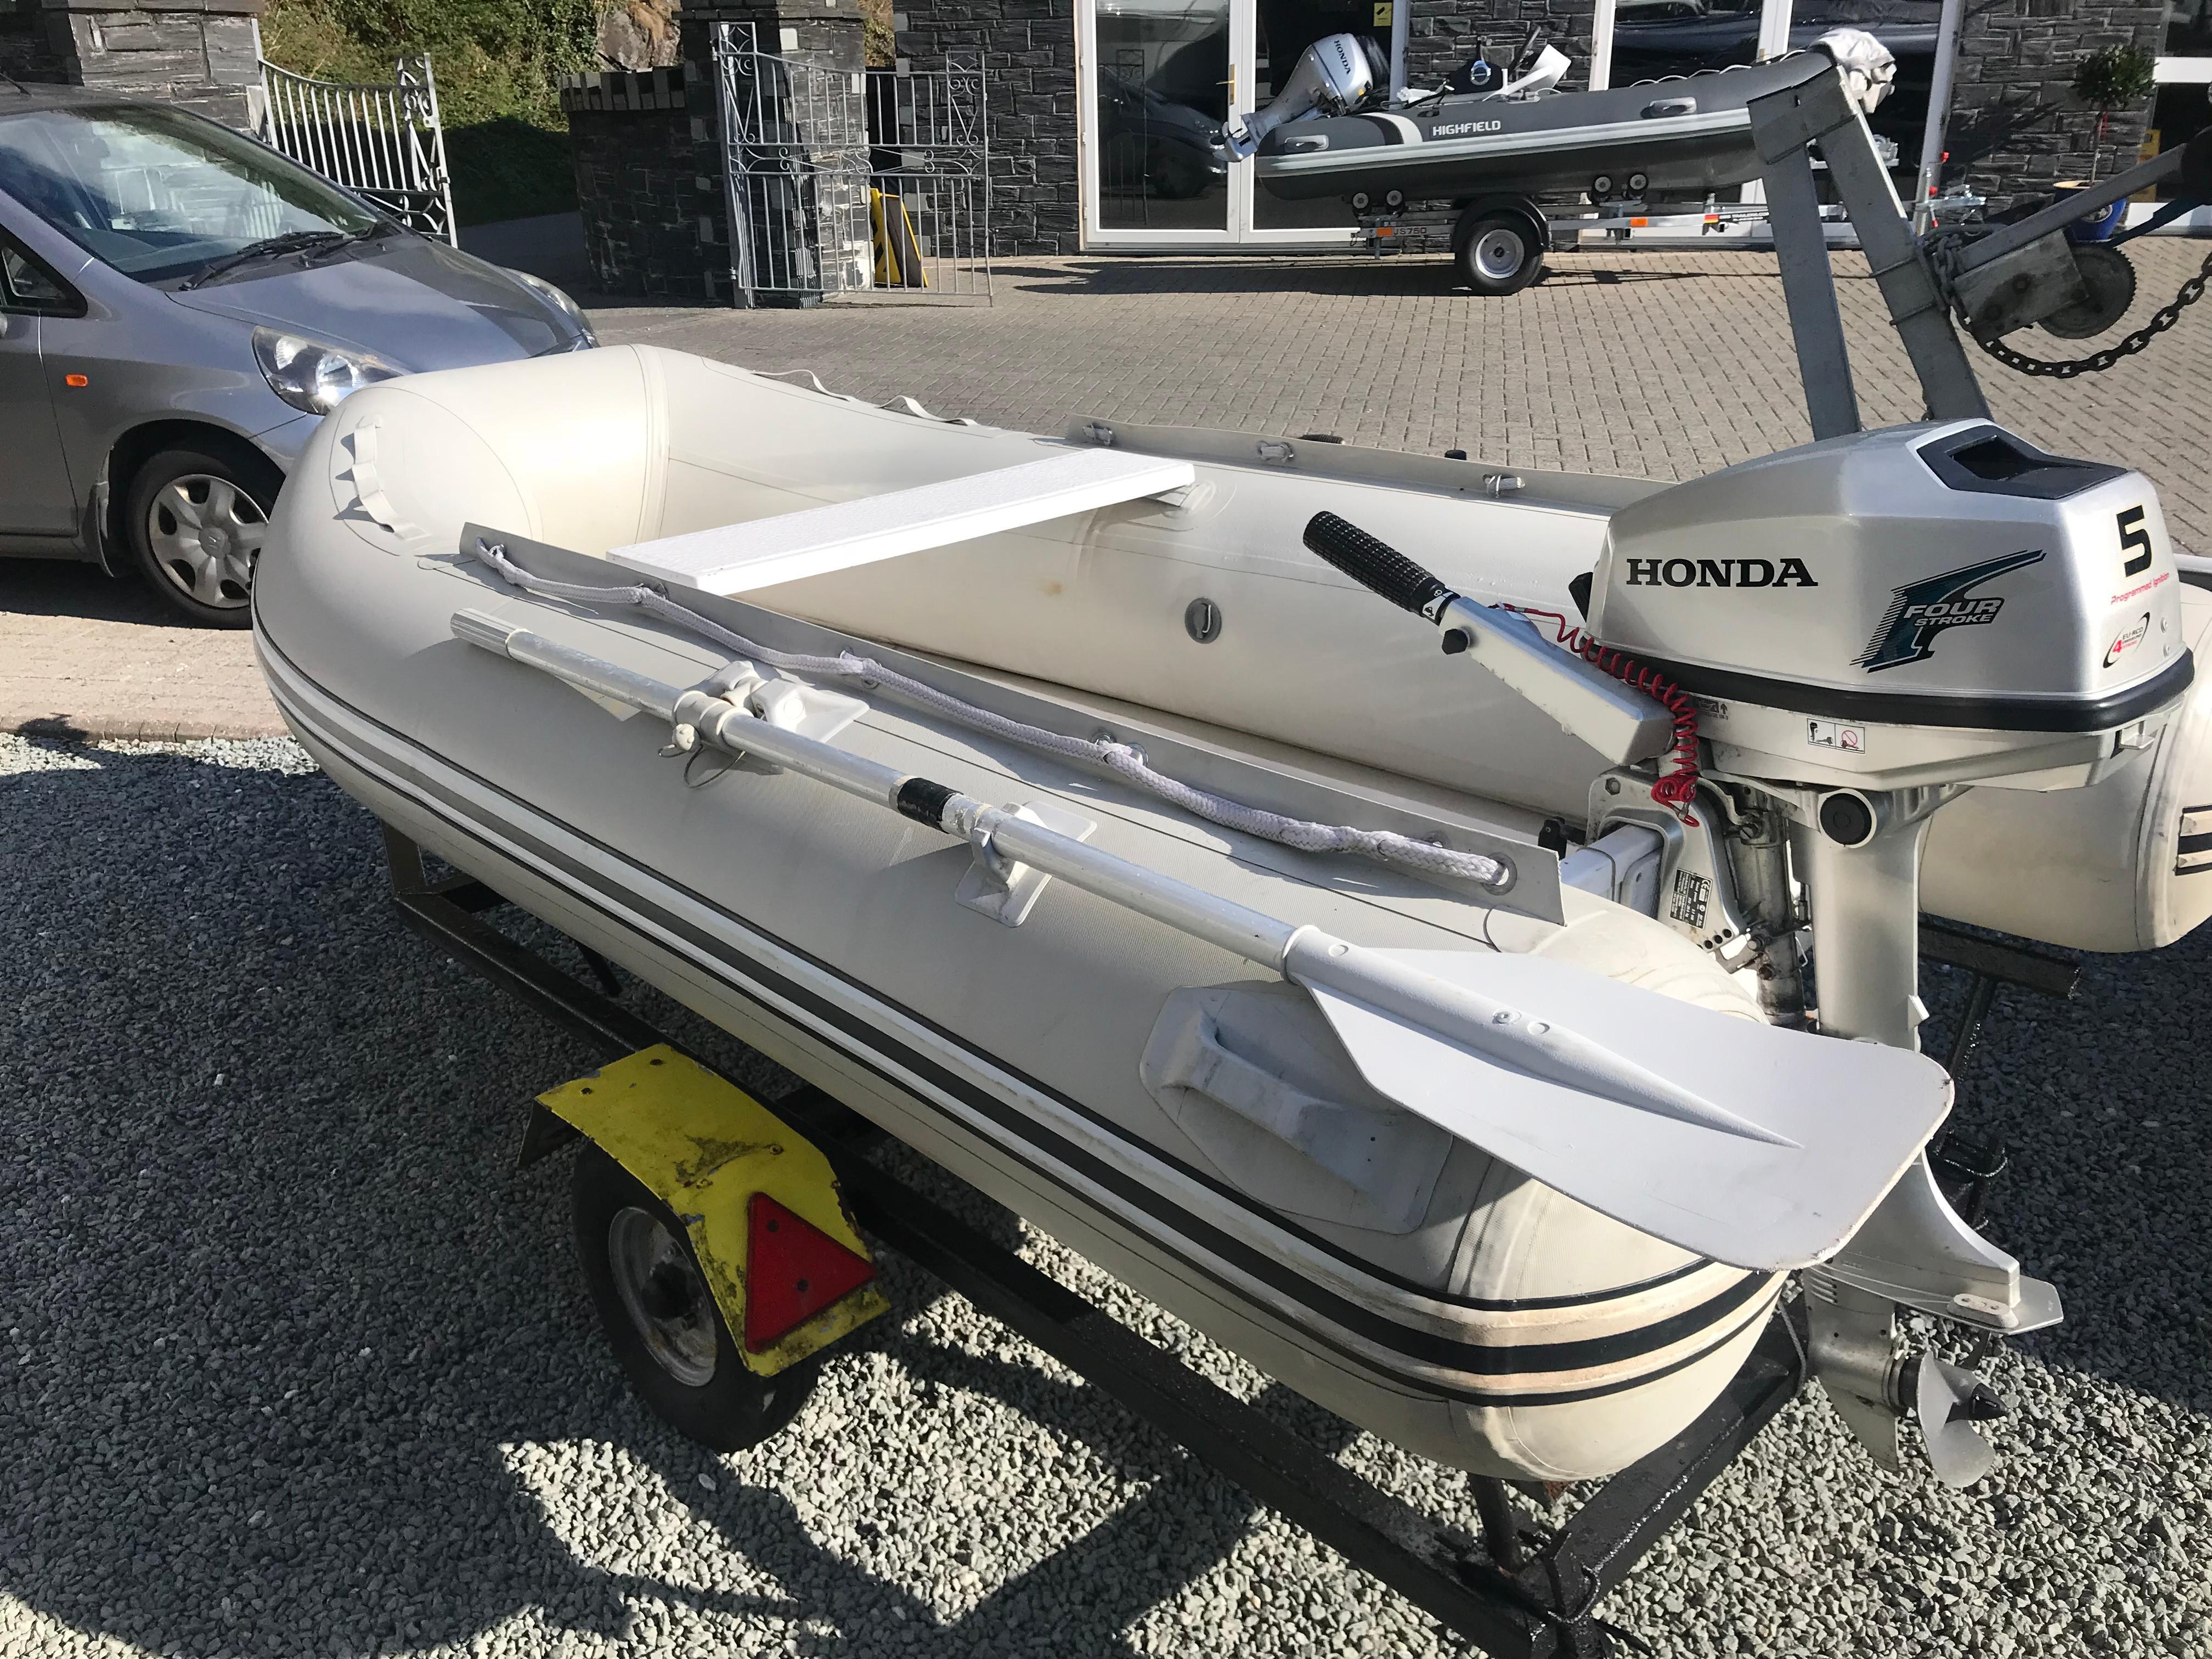 Honda Dealership Ma >> RIB 265 For Sale   Porthmadog - Madog Boat Sales